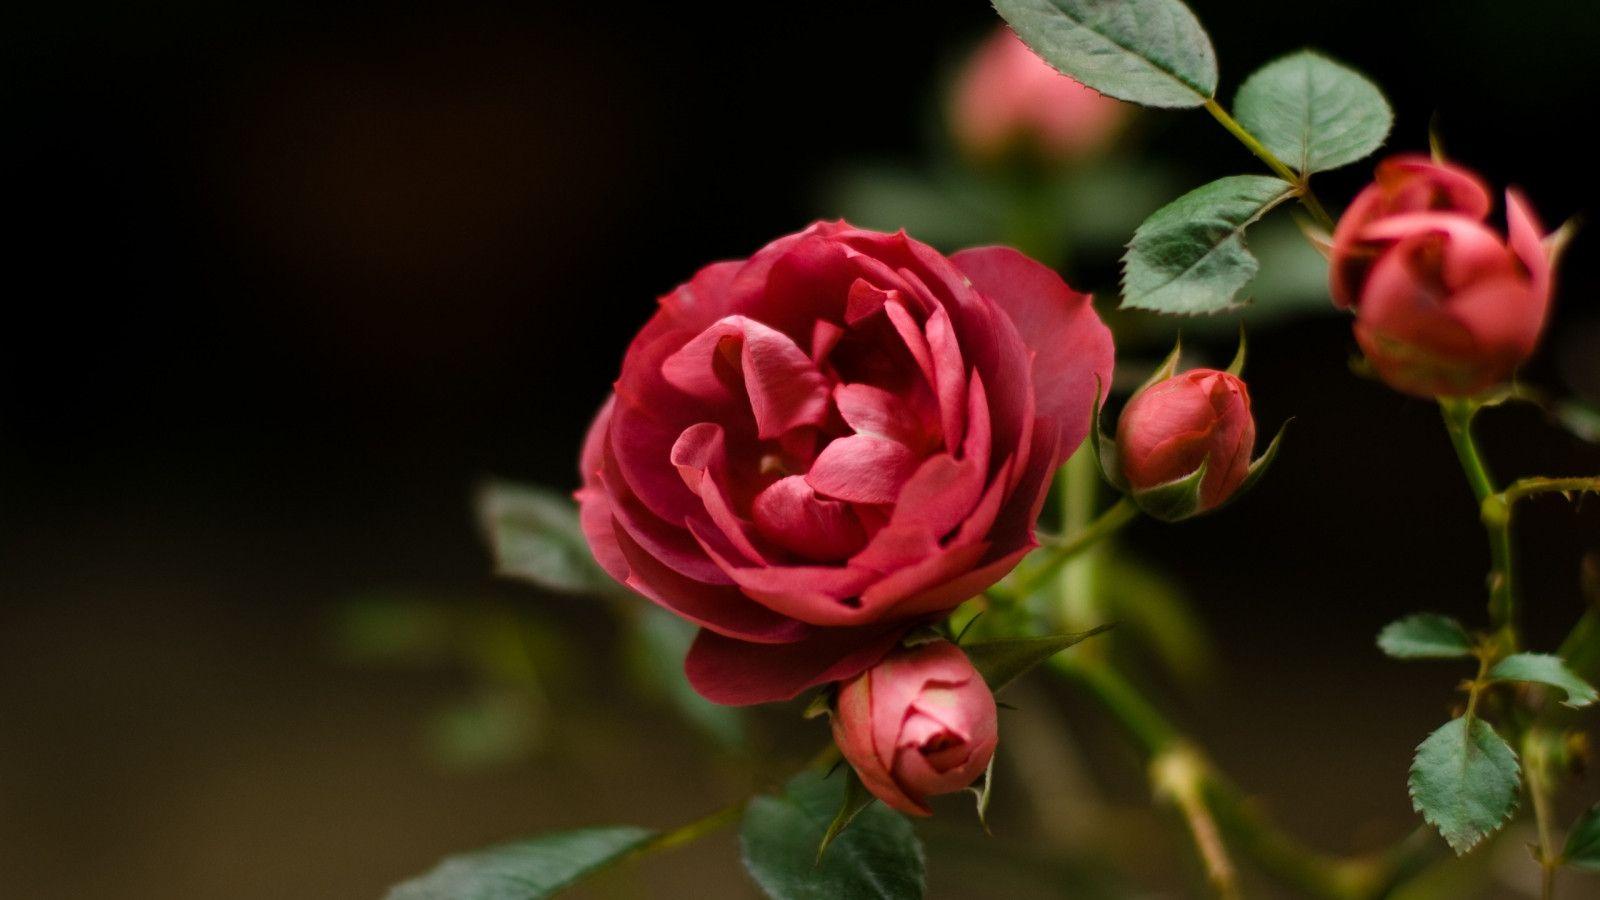 Attractive Orange Roses Wallpapers Hd Morewallpapers Green Rose